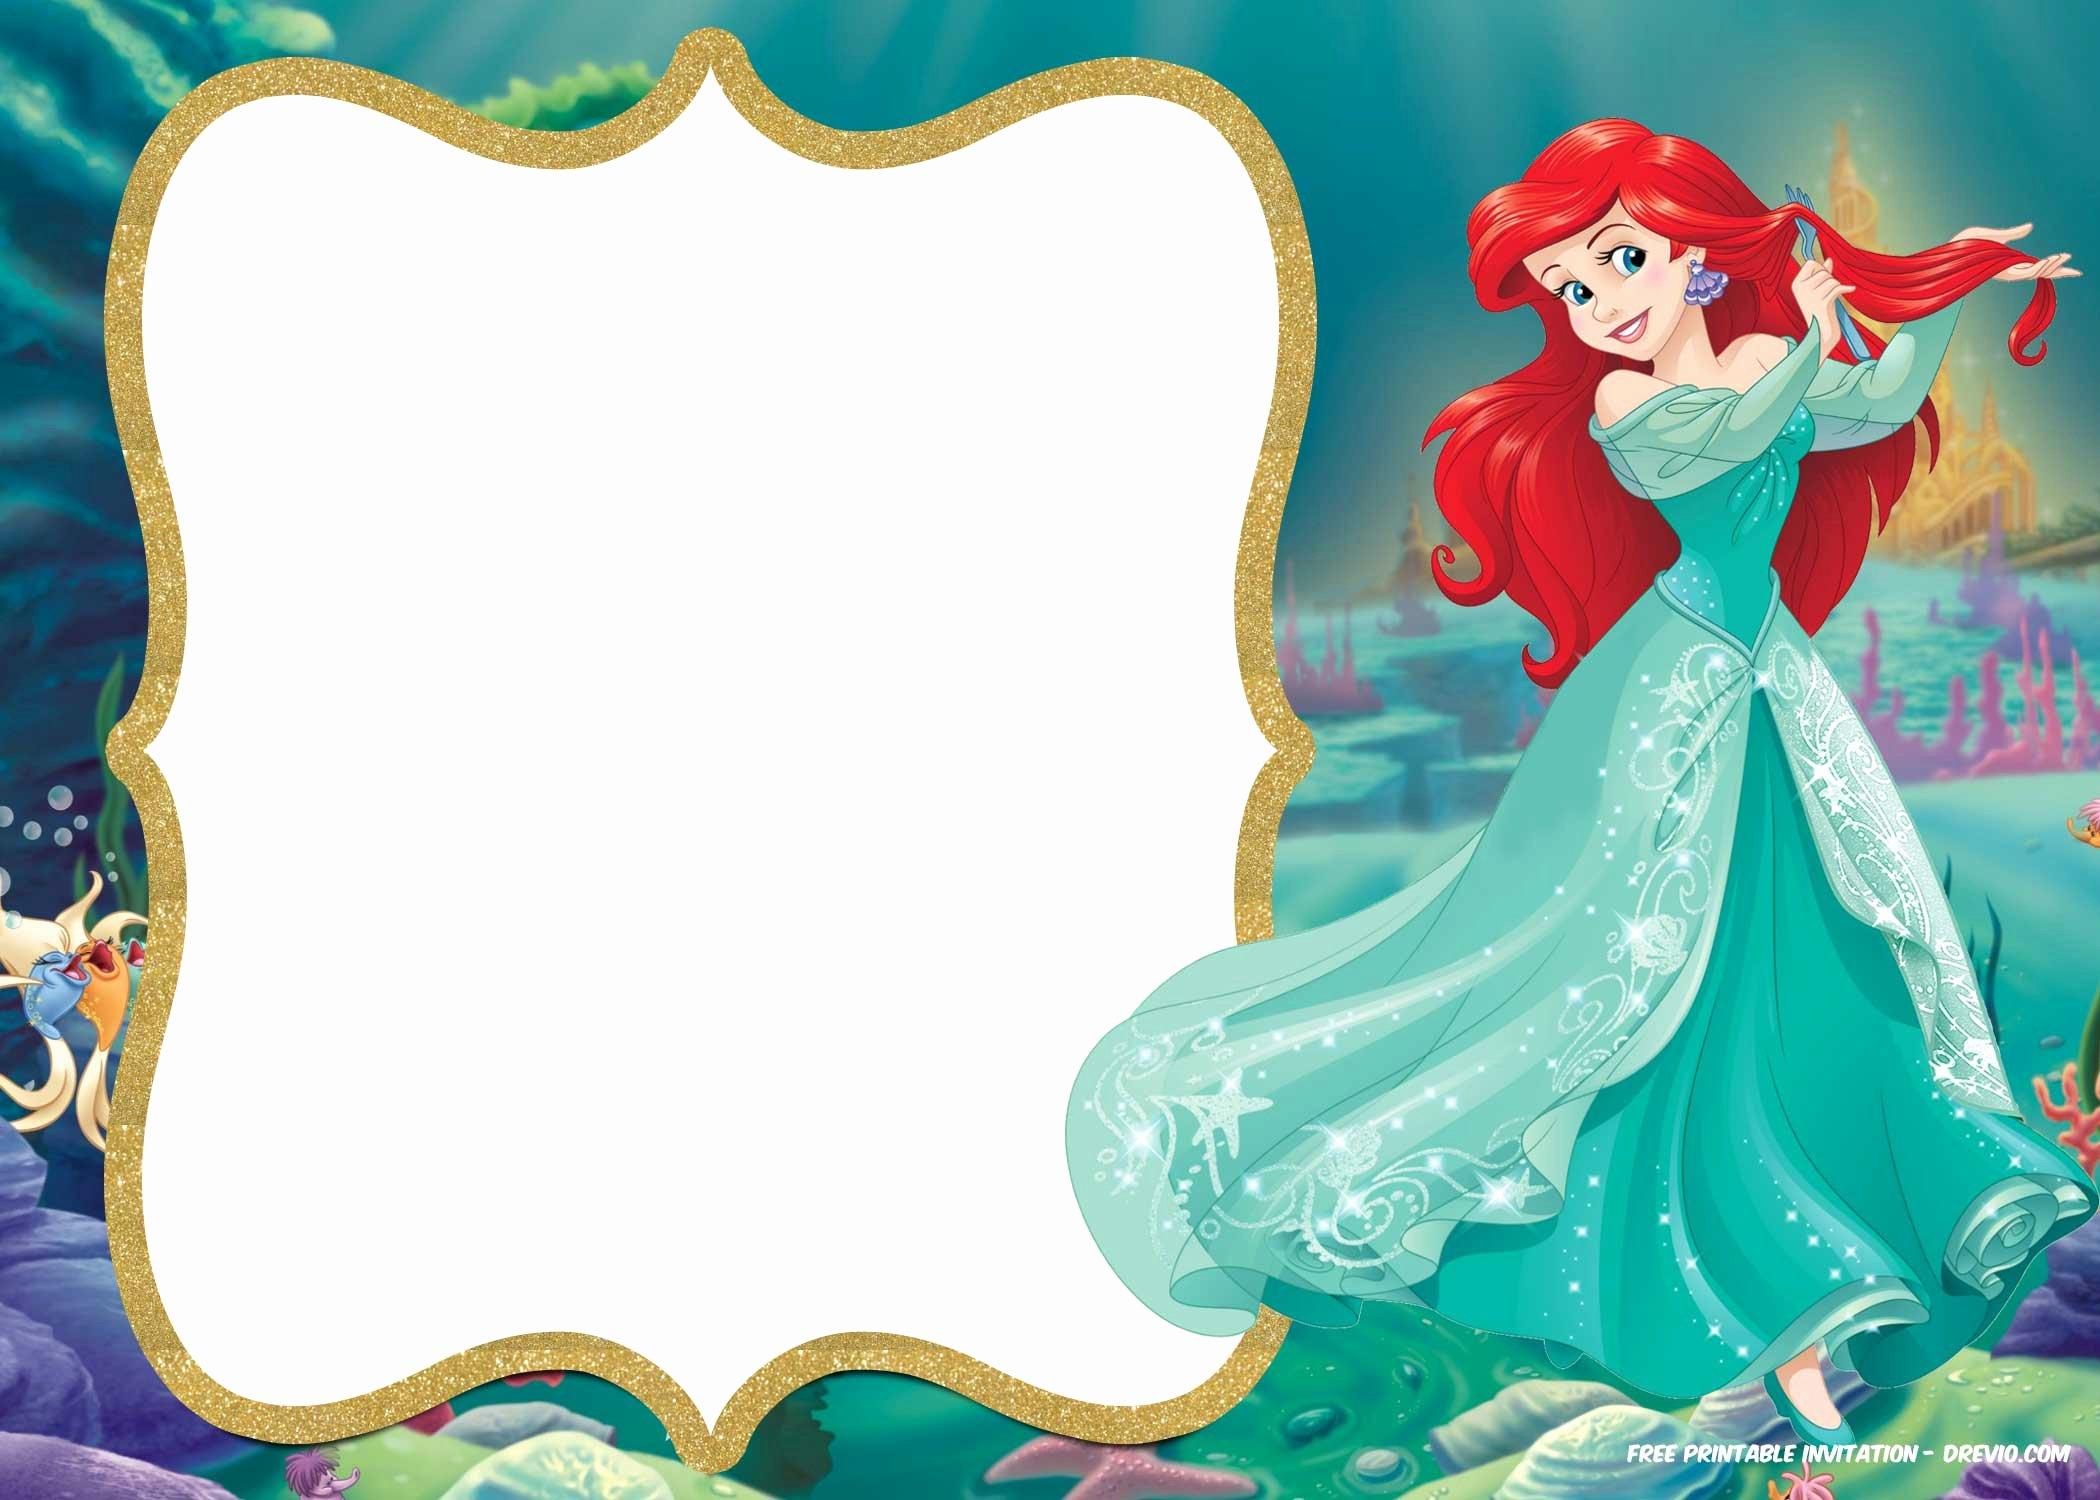 Mermaid Invitation Template Free Best Of Free Printable Ariel Little Mermaid Invitation Template